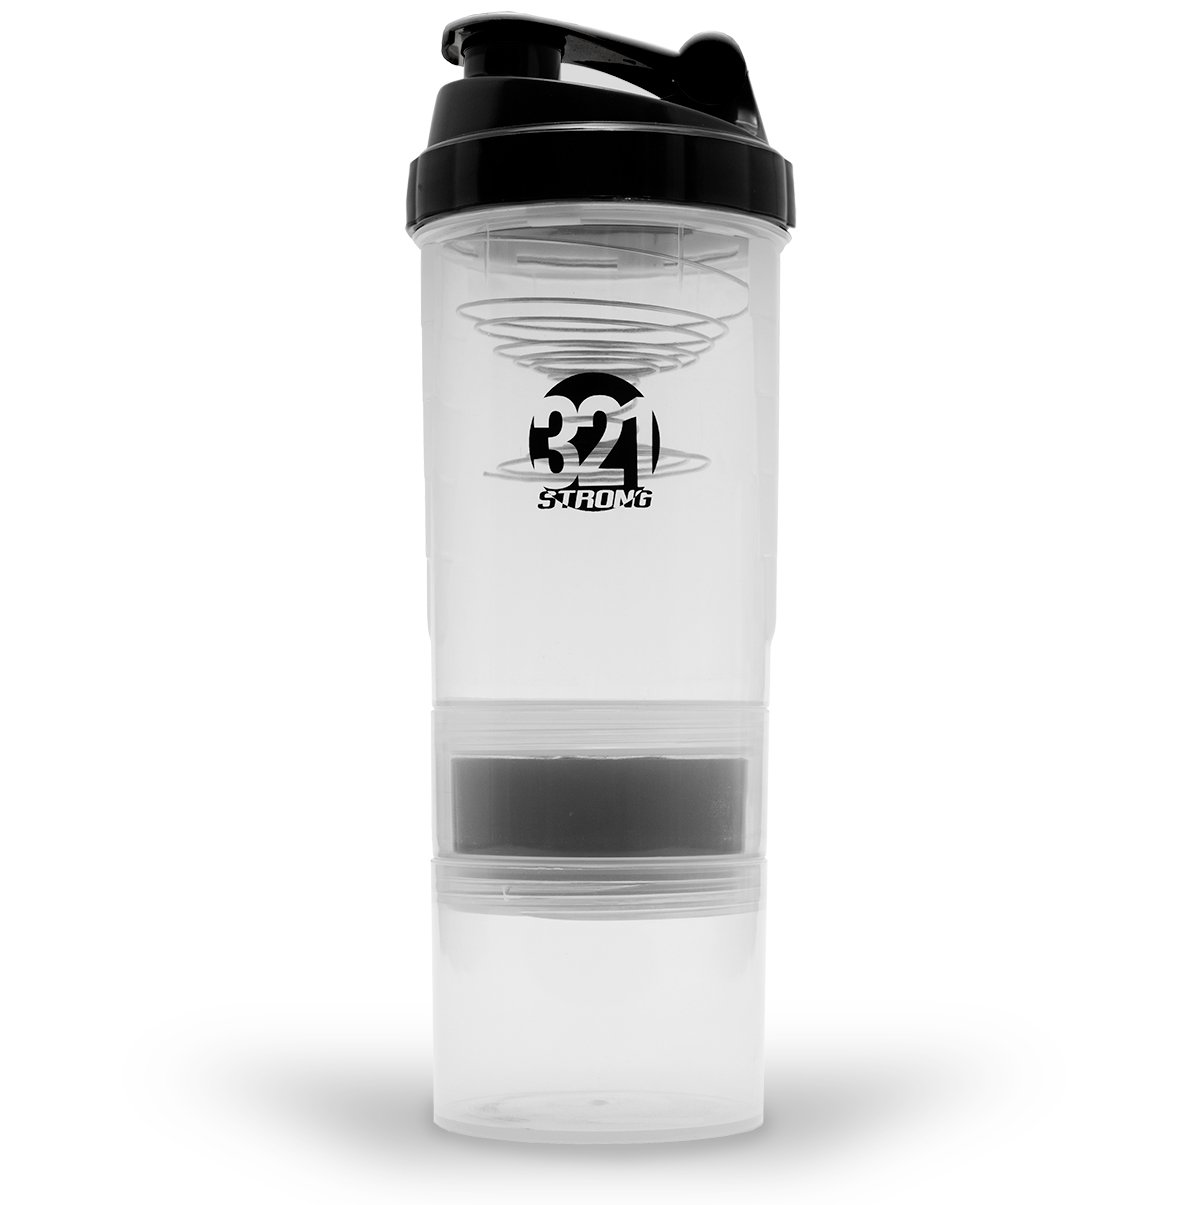 Product thumbnail for 321 STRONG Shaker Bottle